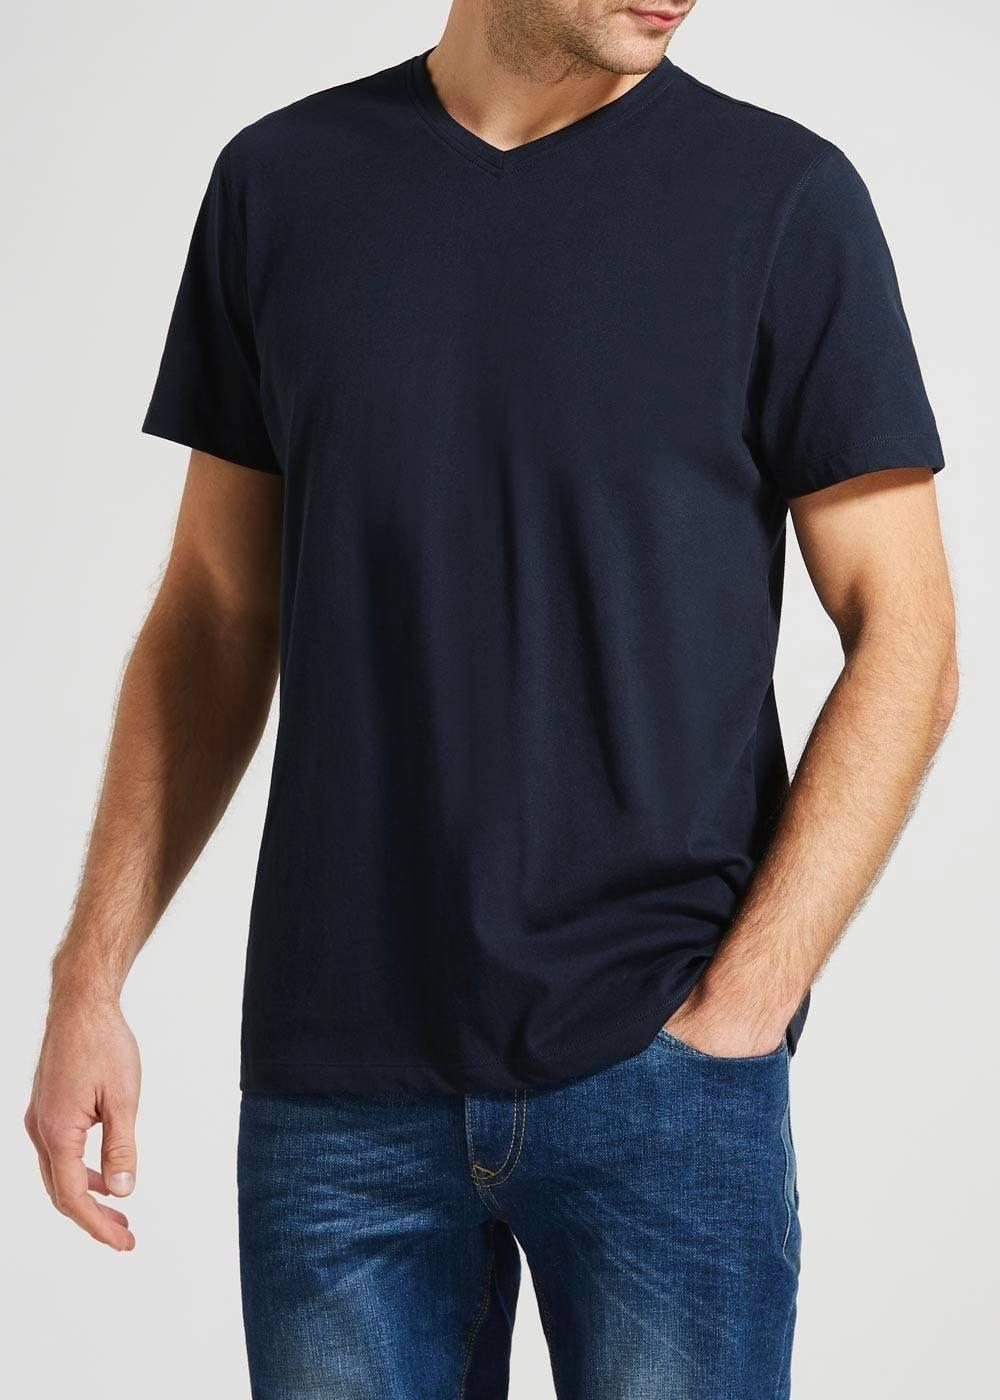 Camiseta básica masculina  gola V